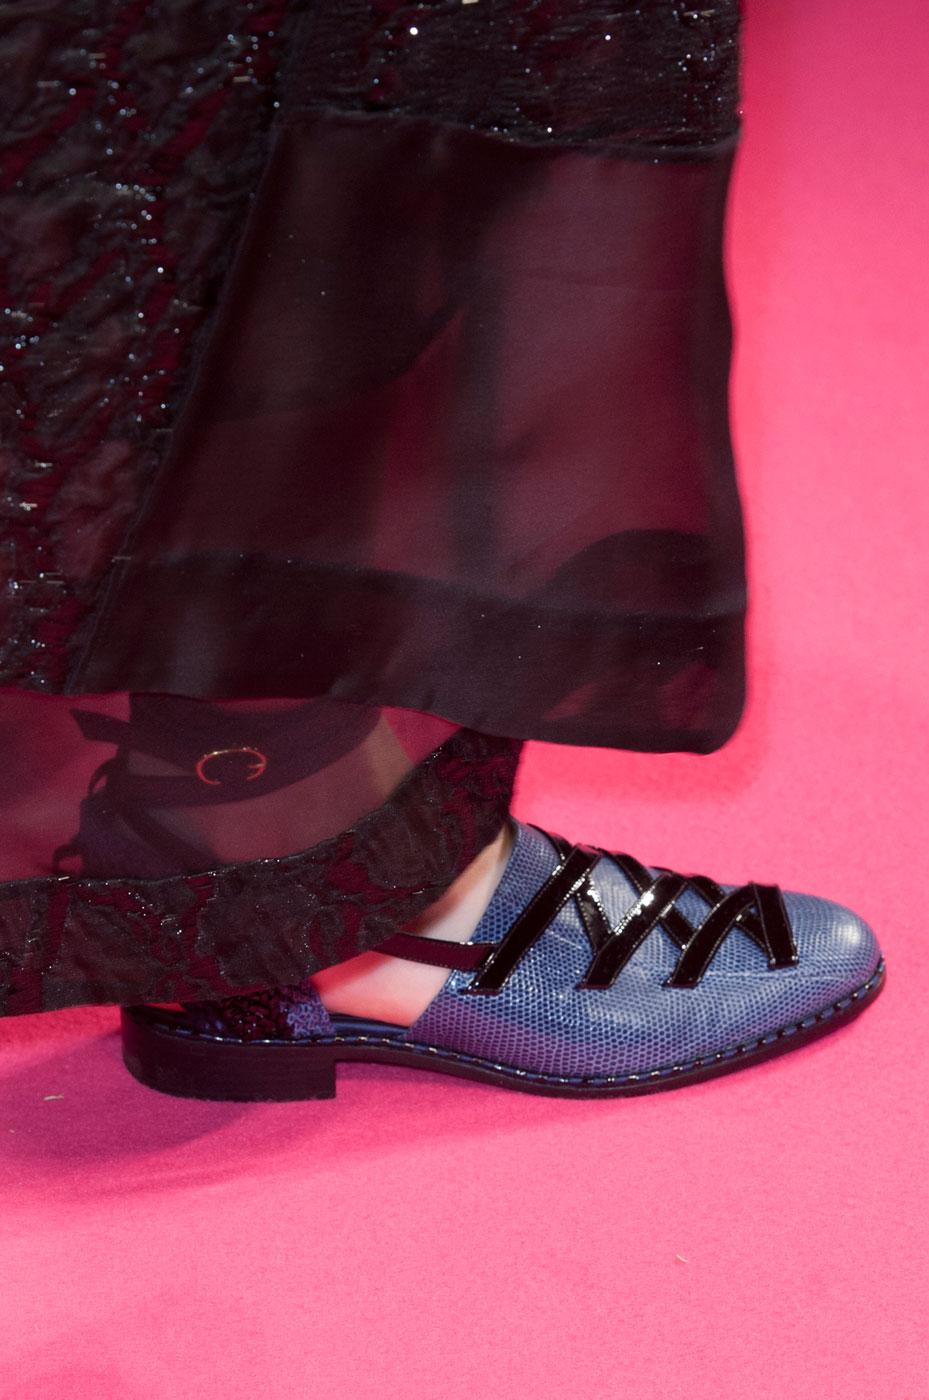 Schiaparelli-fashion-runway-show-close-ups-haute-couture-paris-spring-summer-2015-the-impression-27